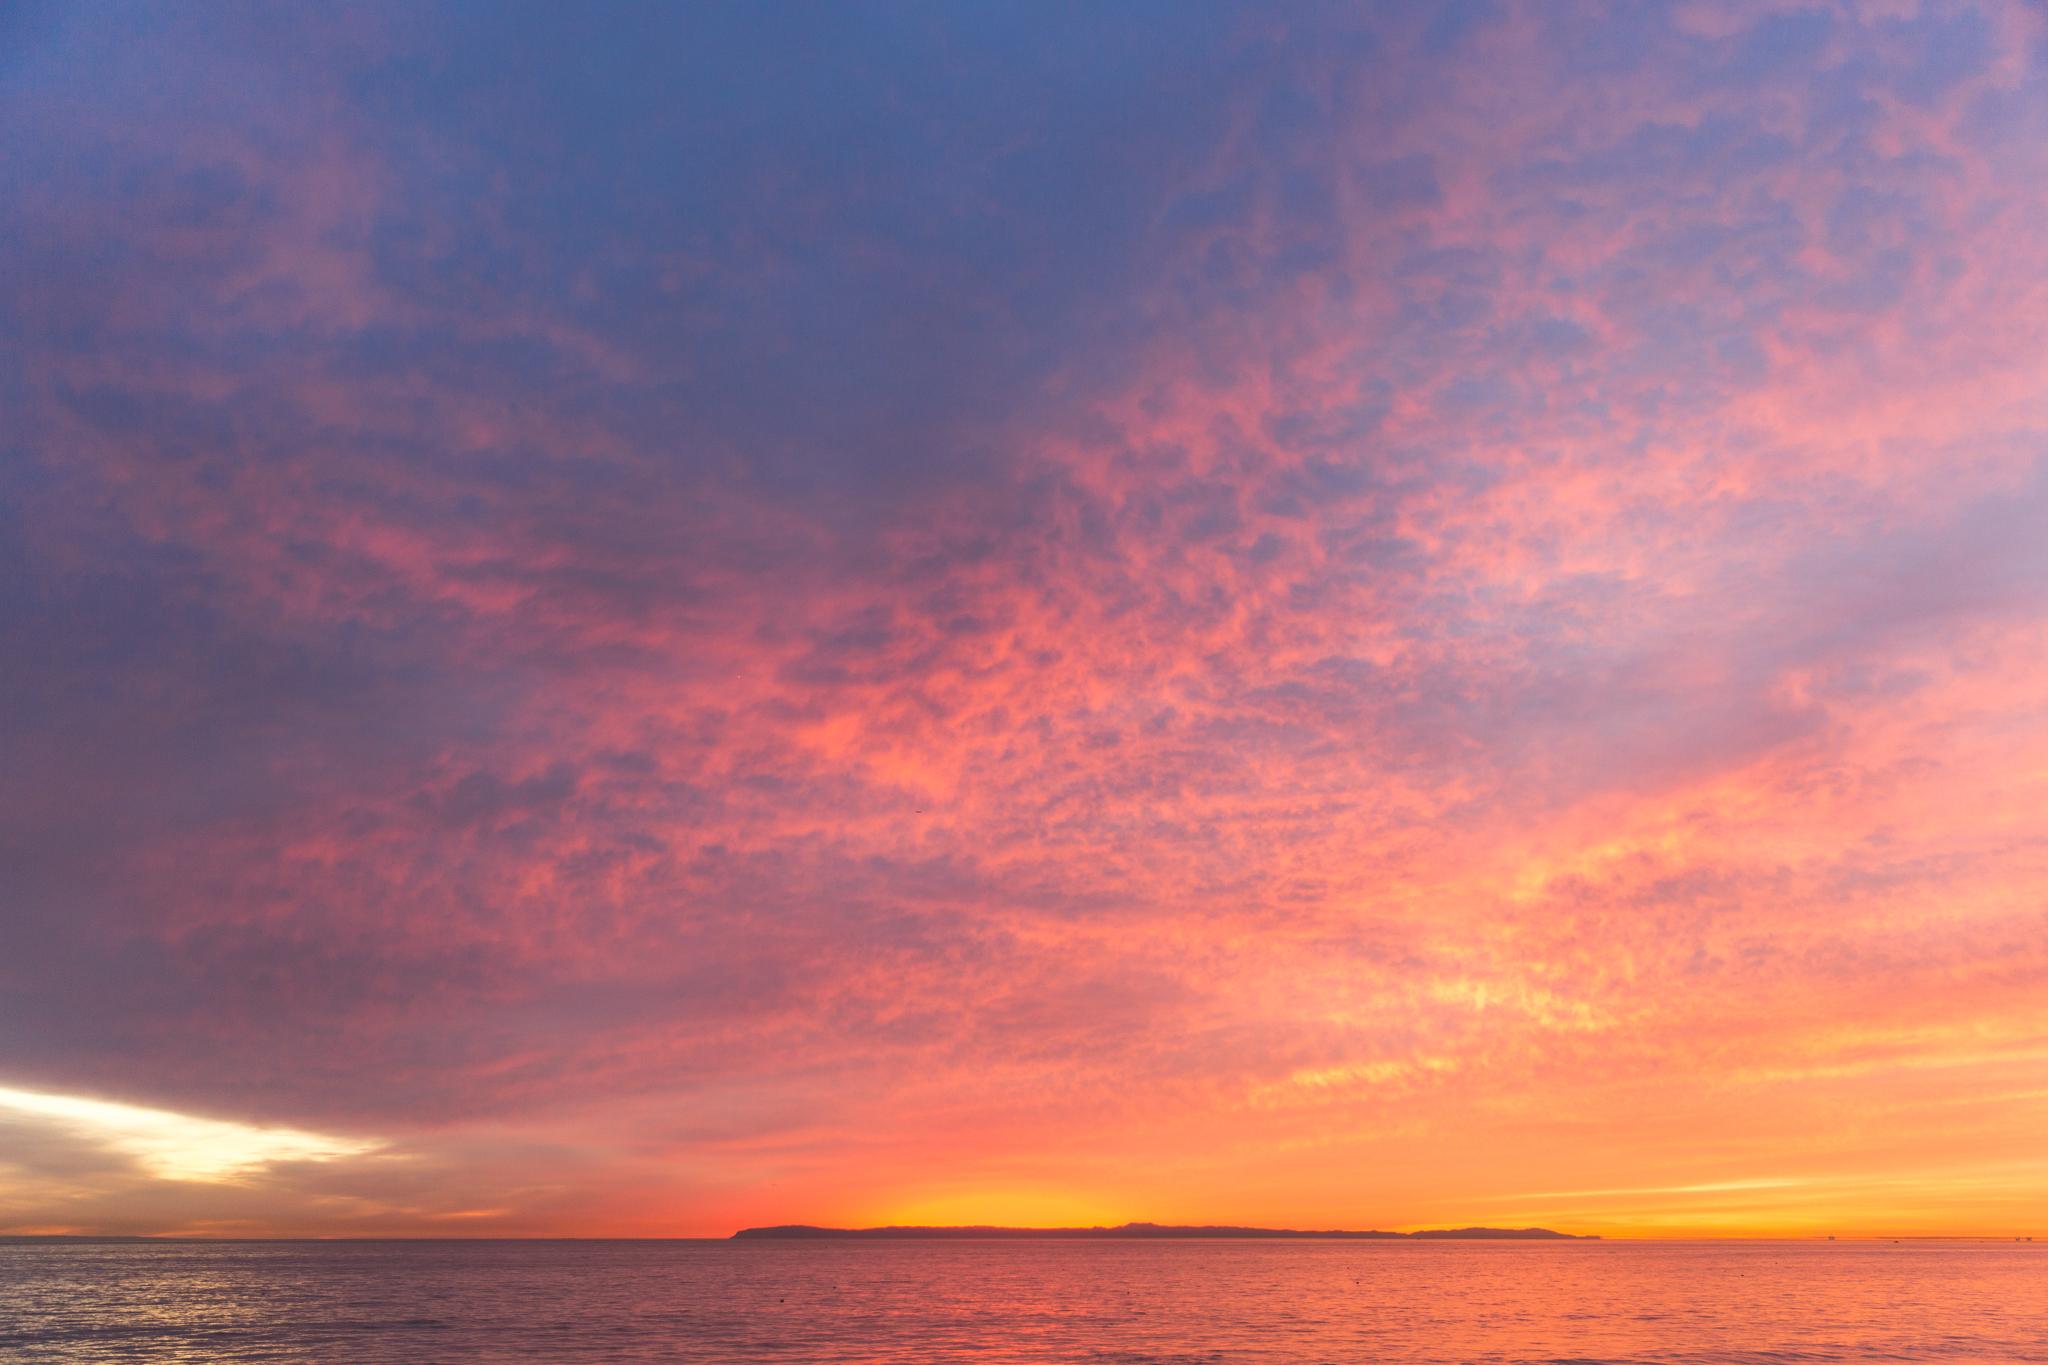 Babettes_Takeaway_Sunset_Jasmine-6.jpg